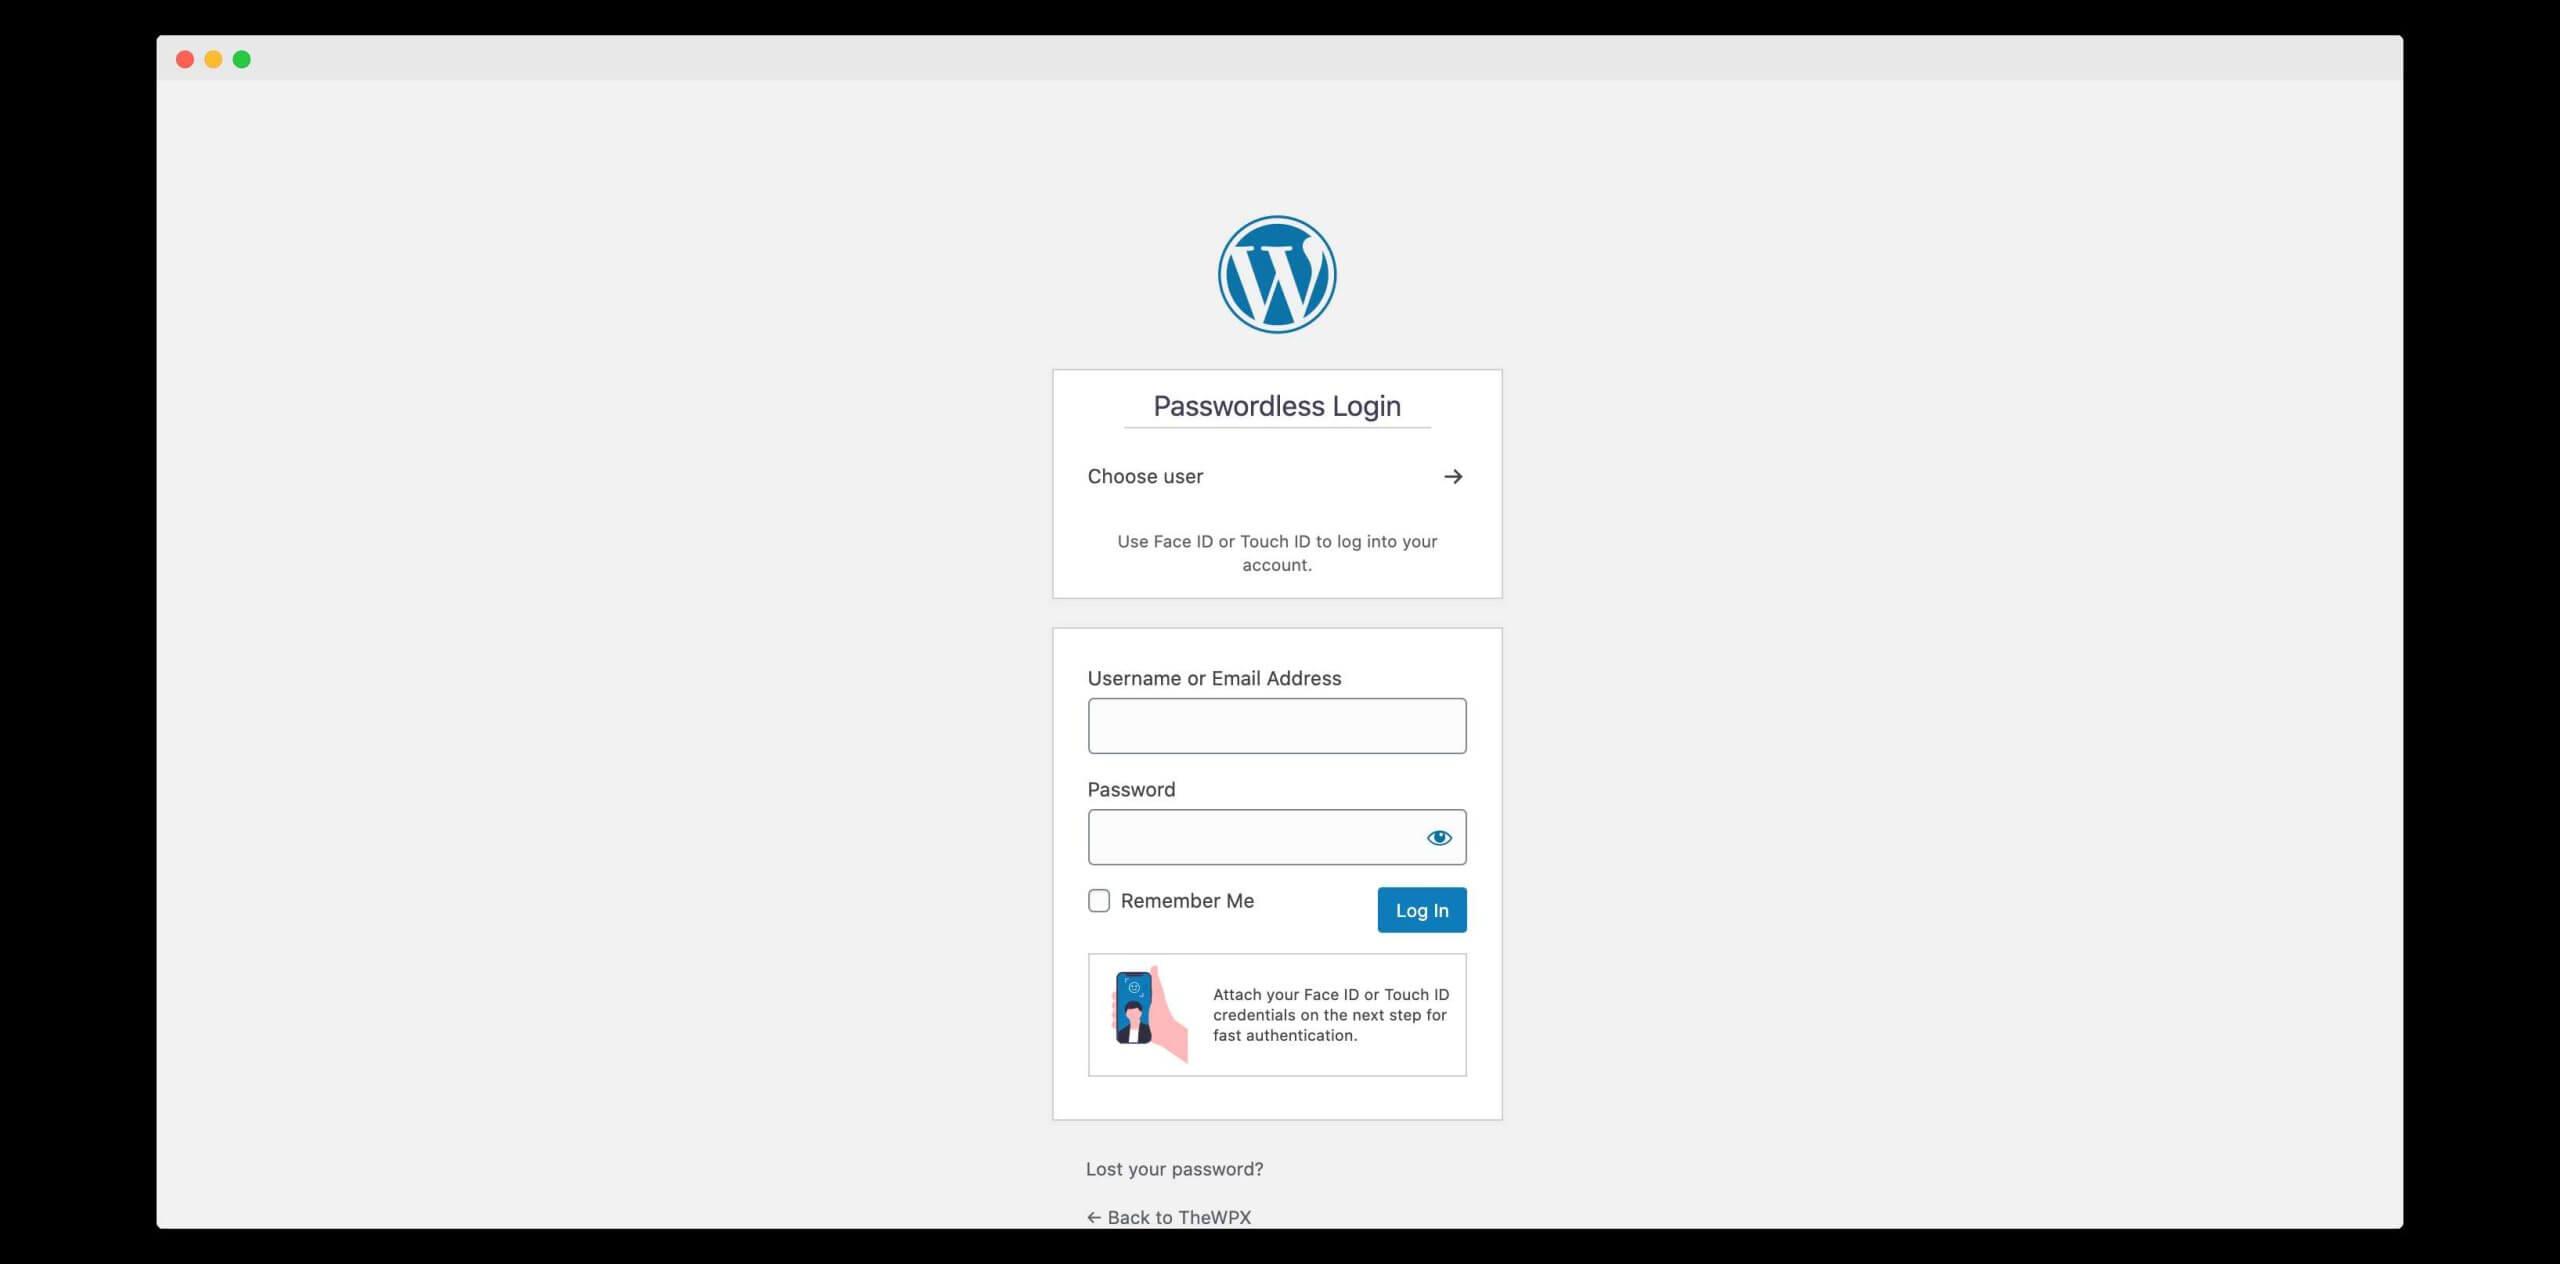 wordpress login with passwordless wp